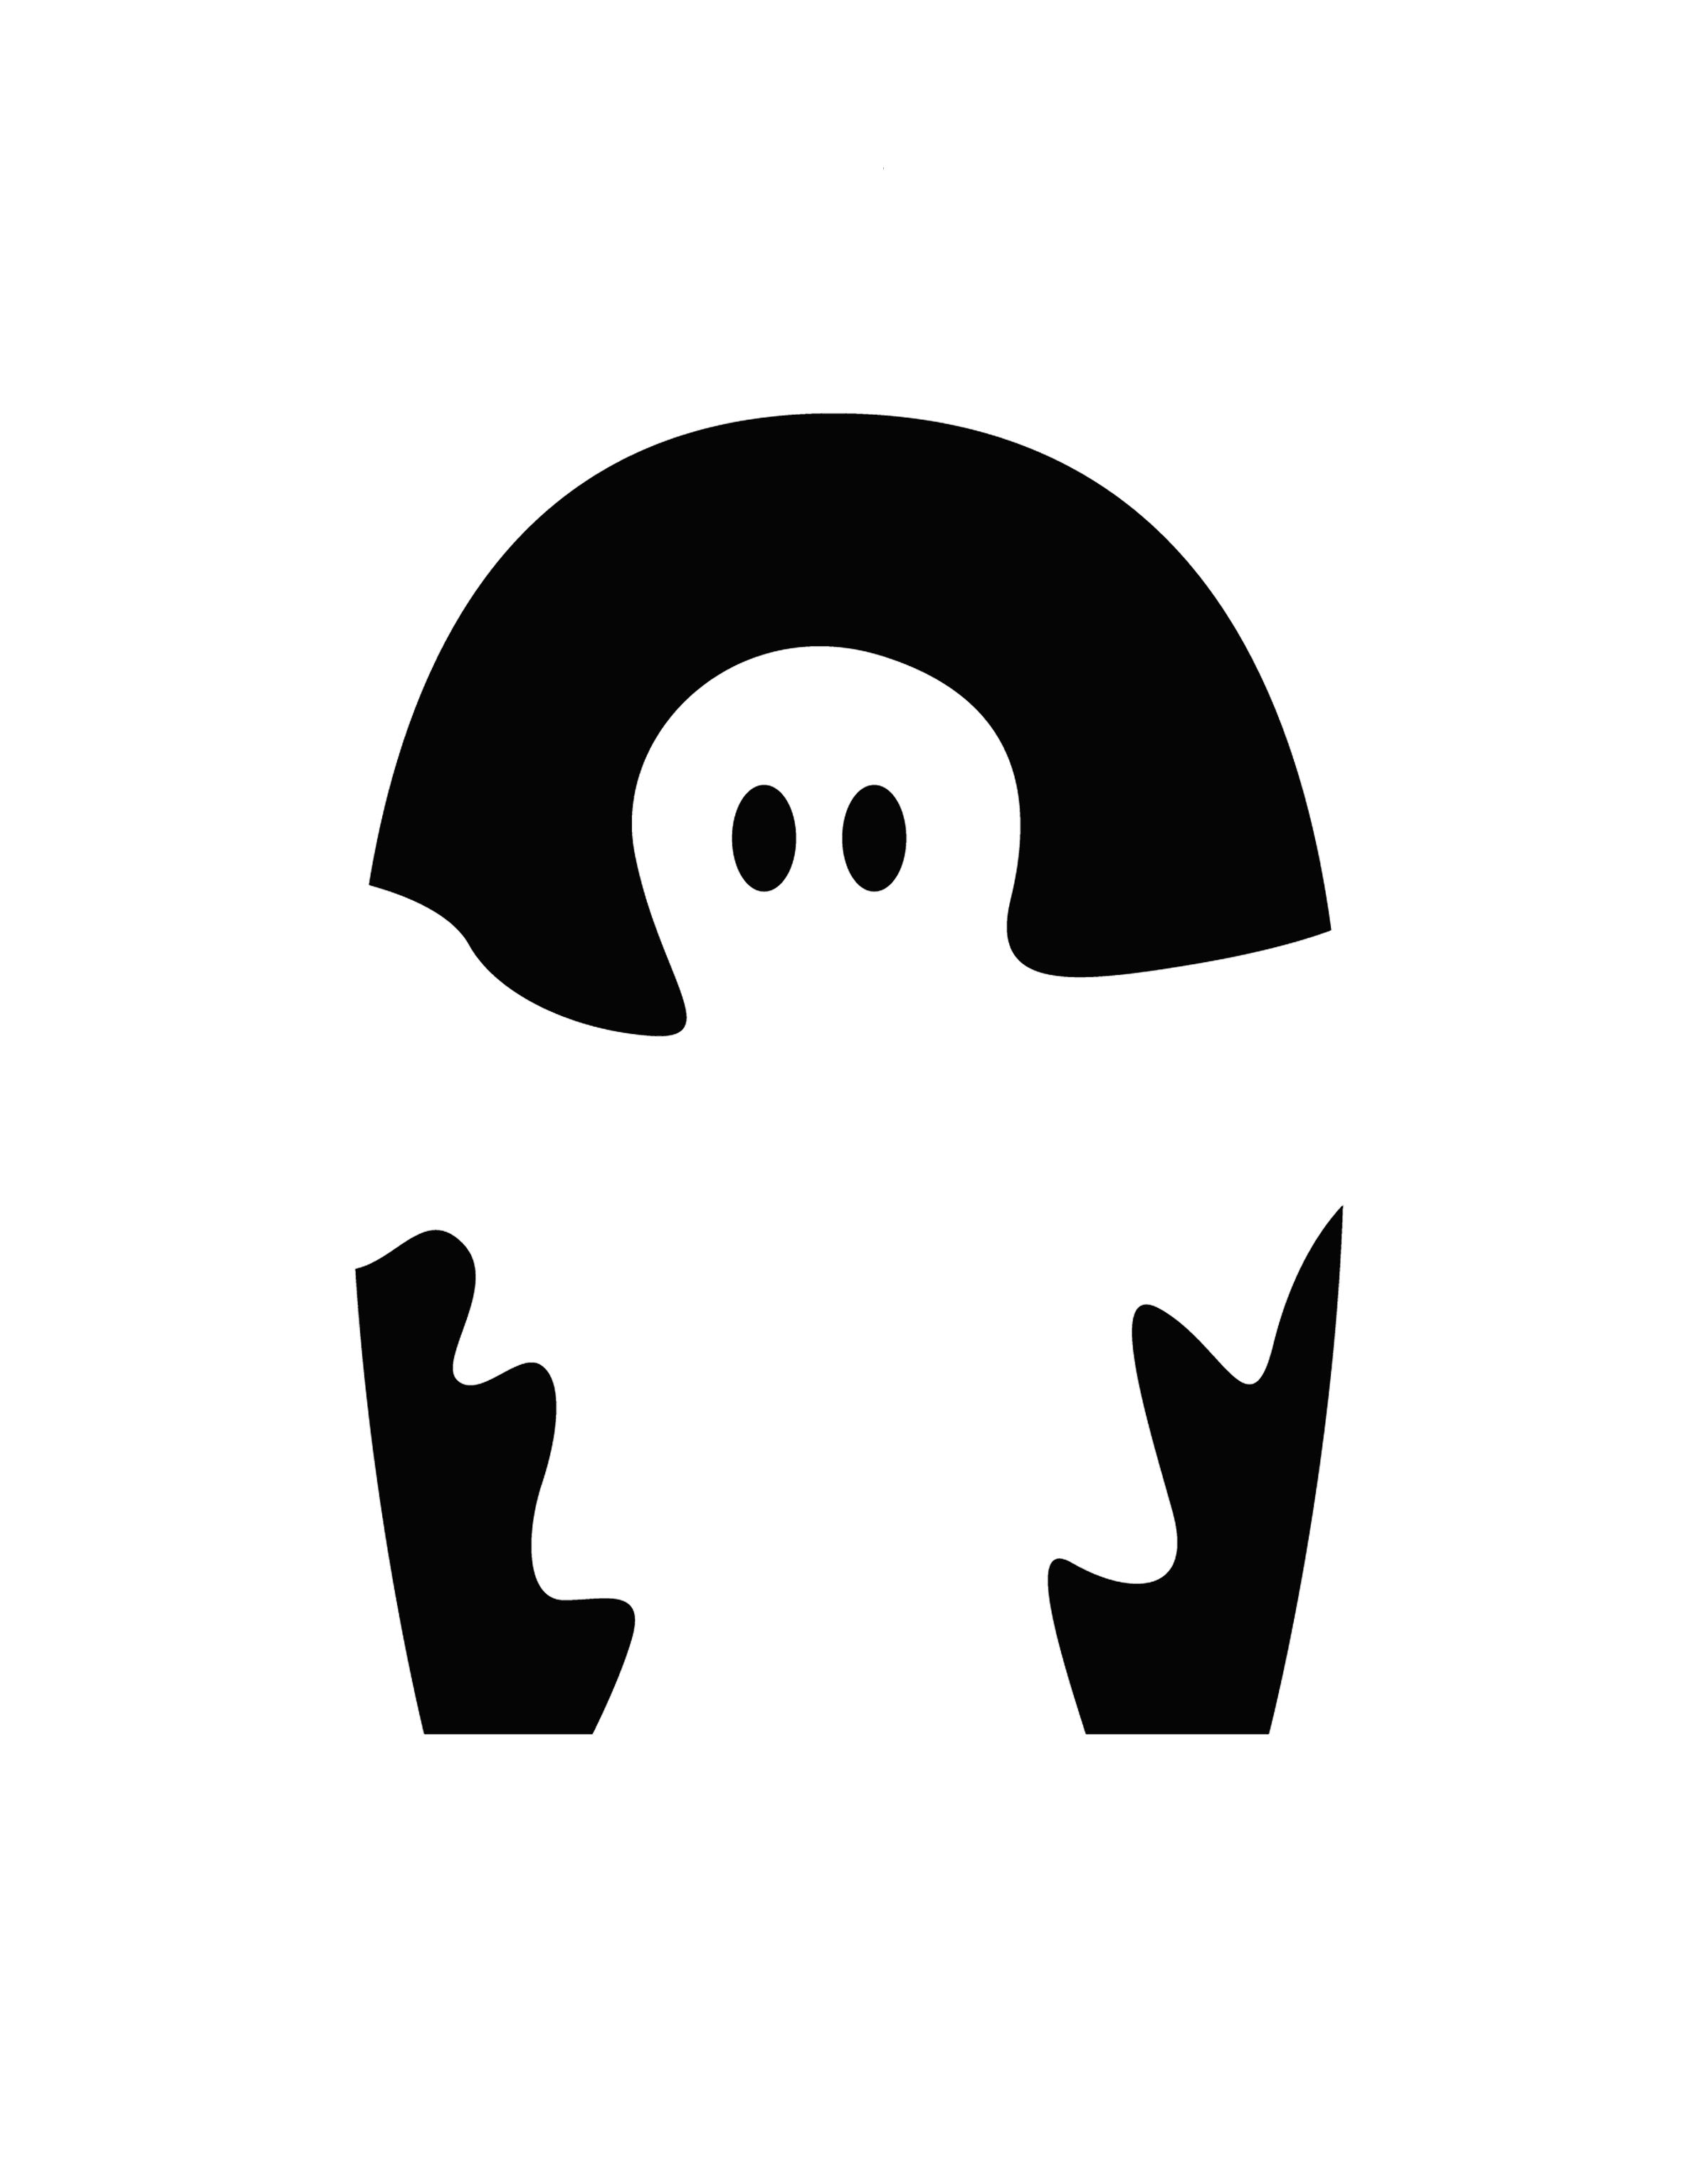 Ghost Pumpkin Stencils Ghost - Pumpkin Templa...